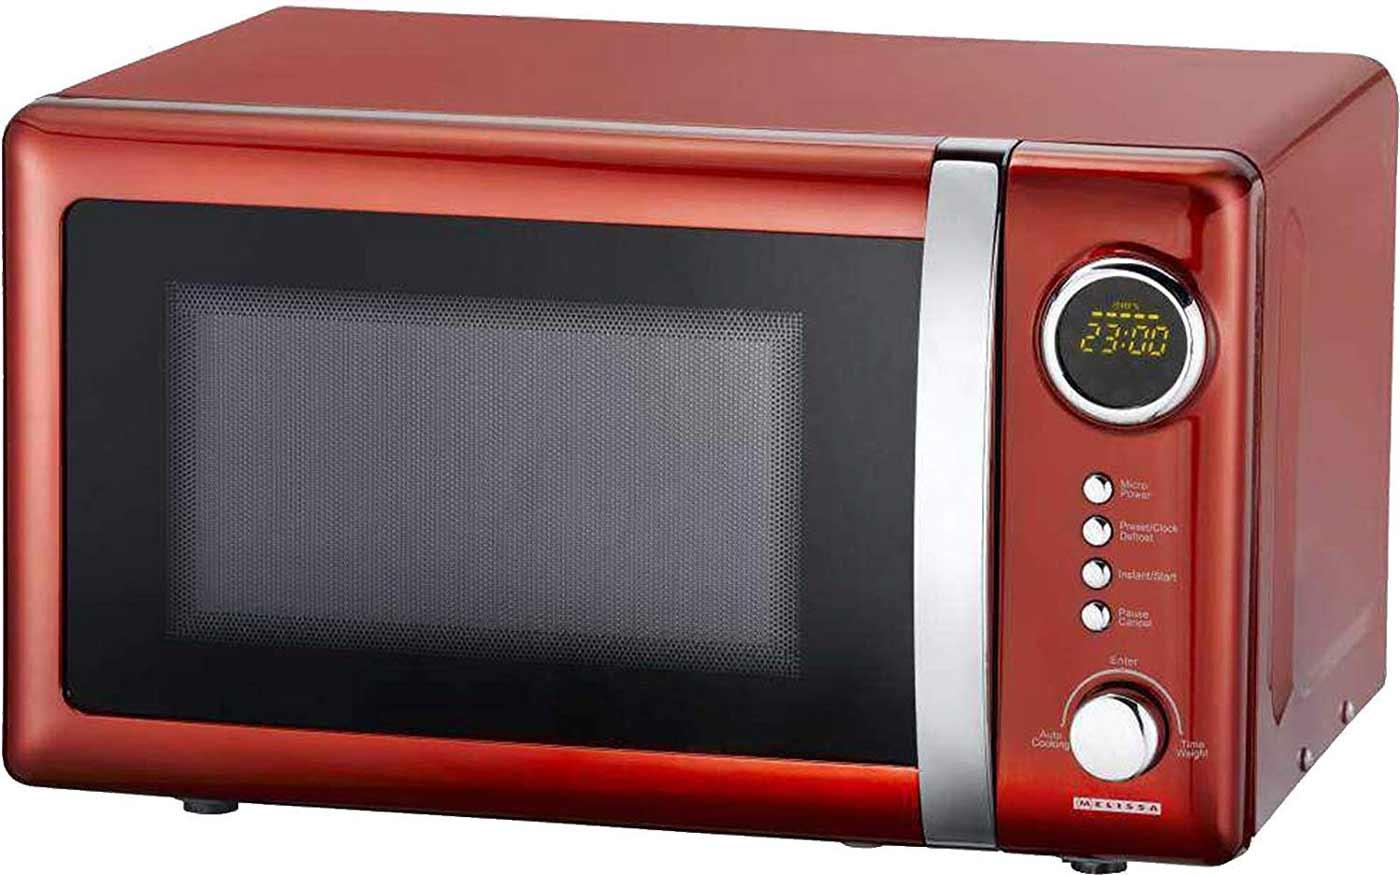 Classico Mikrowelle Retro Design Melissa 16330109 rot metallic – Bild 2